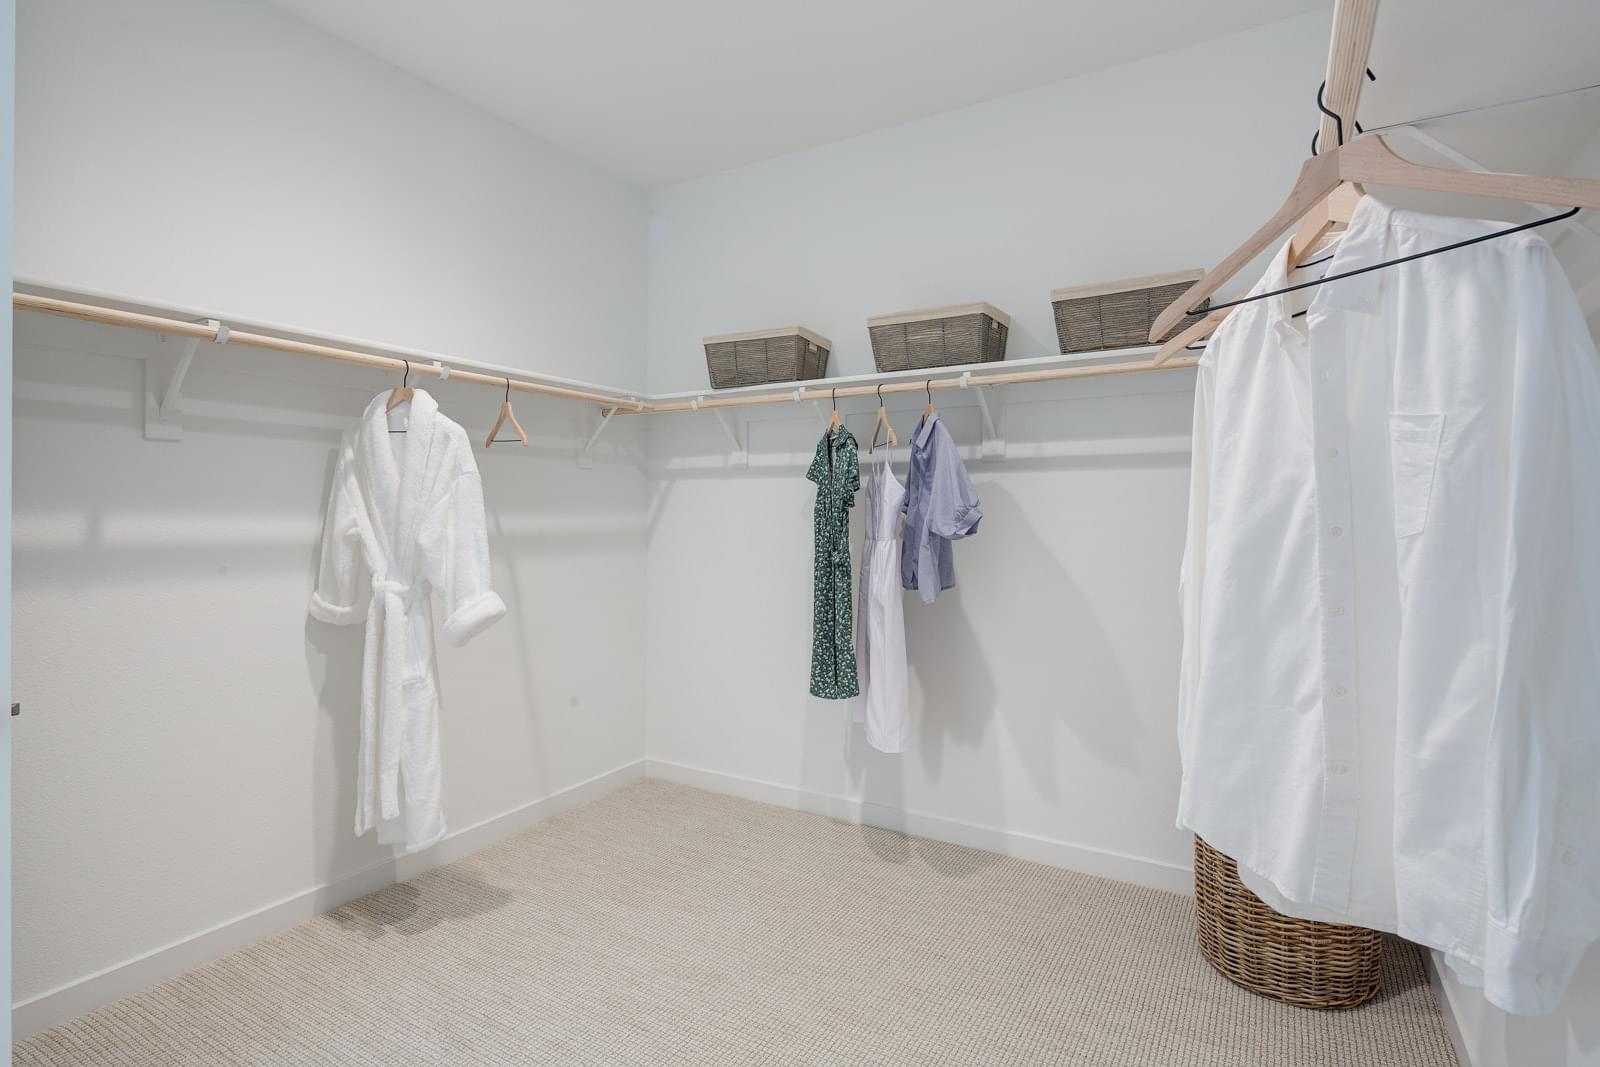 Residence 3 Walk-In Closet